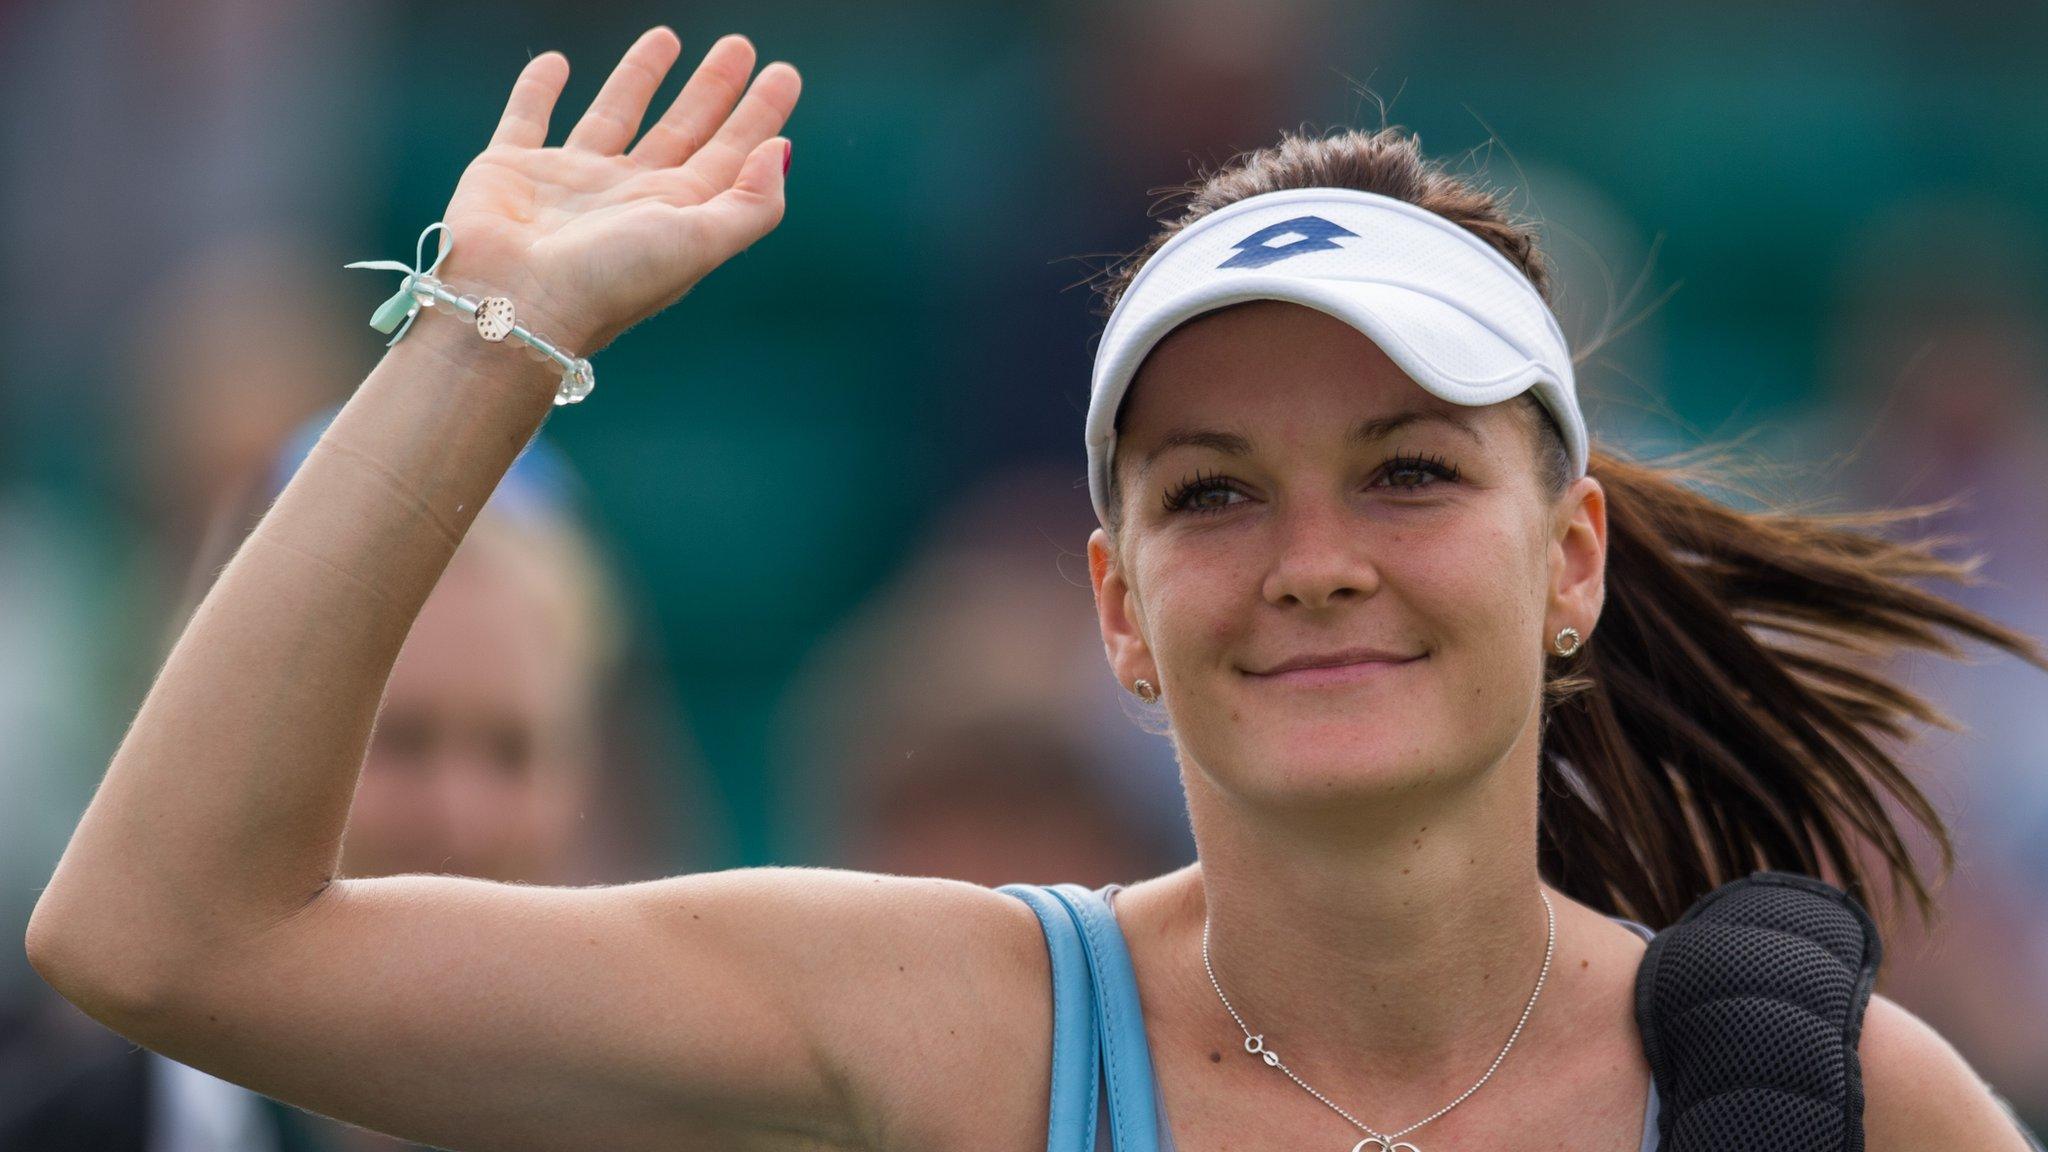 Agnieszka Radwanska: Wimbledon finalist retires from tennis aged 29